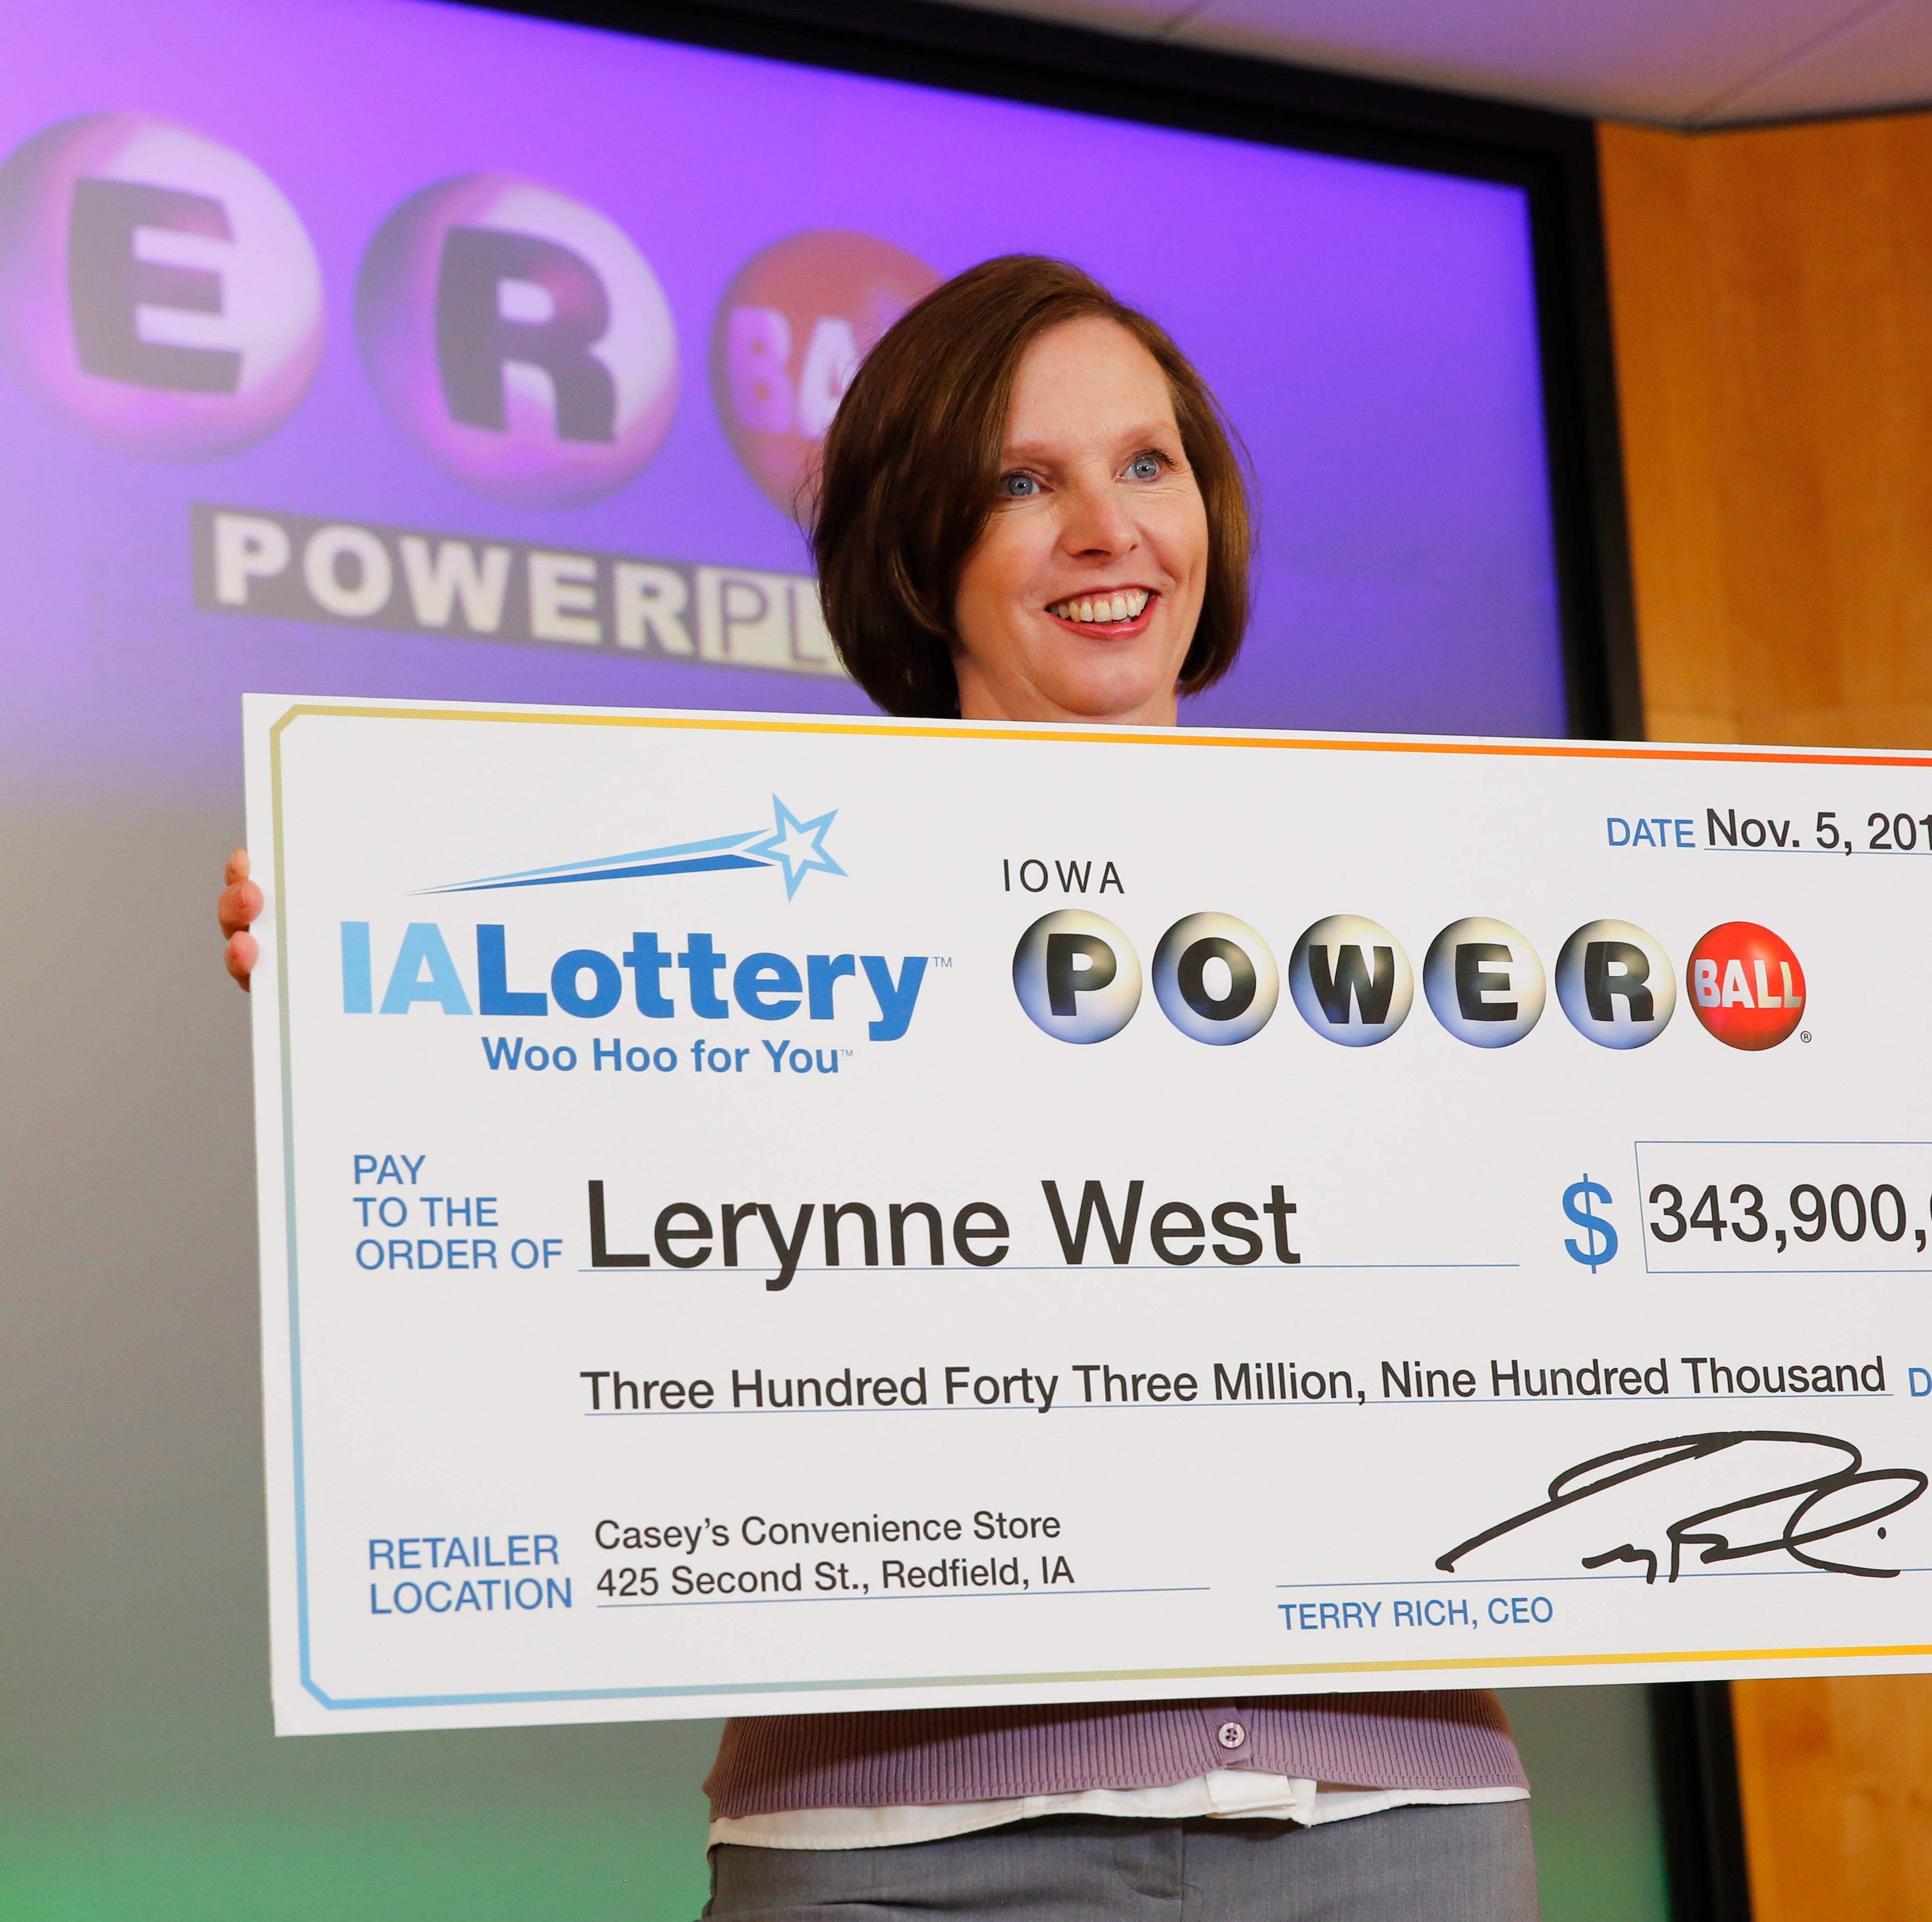 Iowa Powerball jackpot winner left ticket on the floor of her sister's pickup